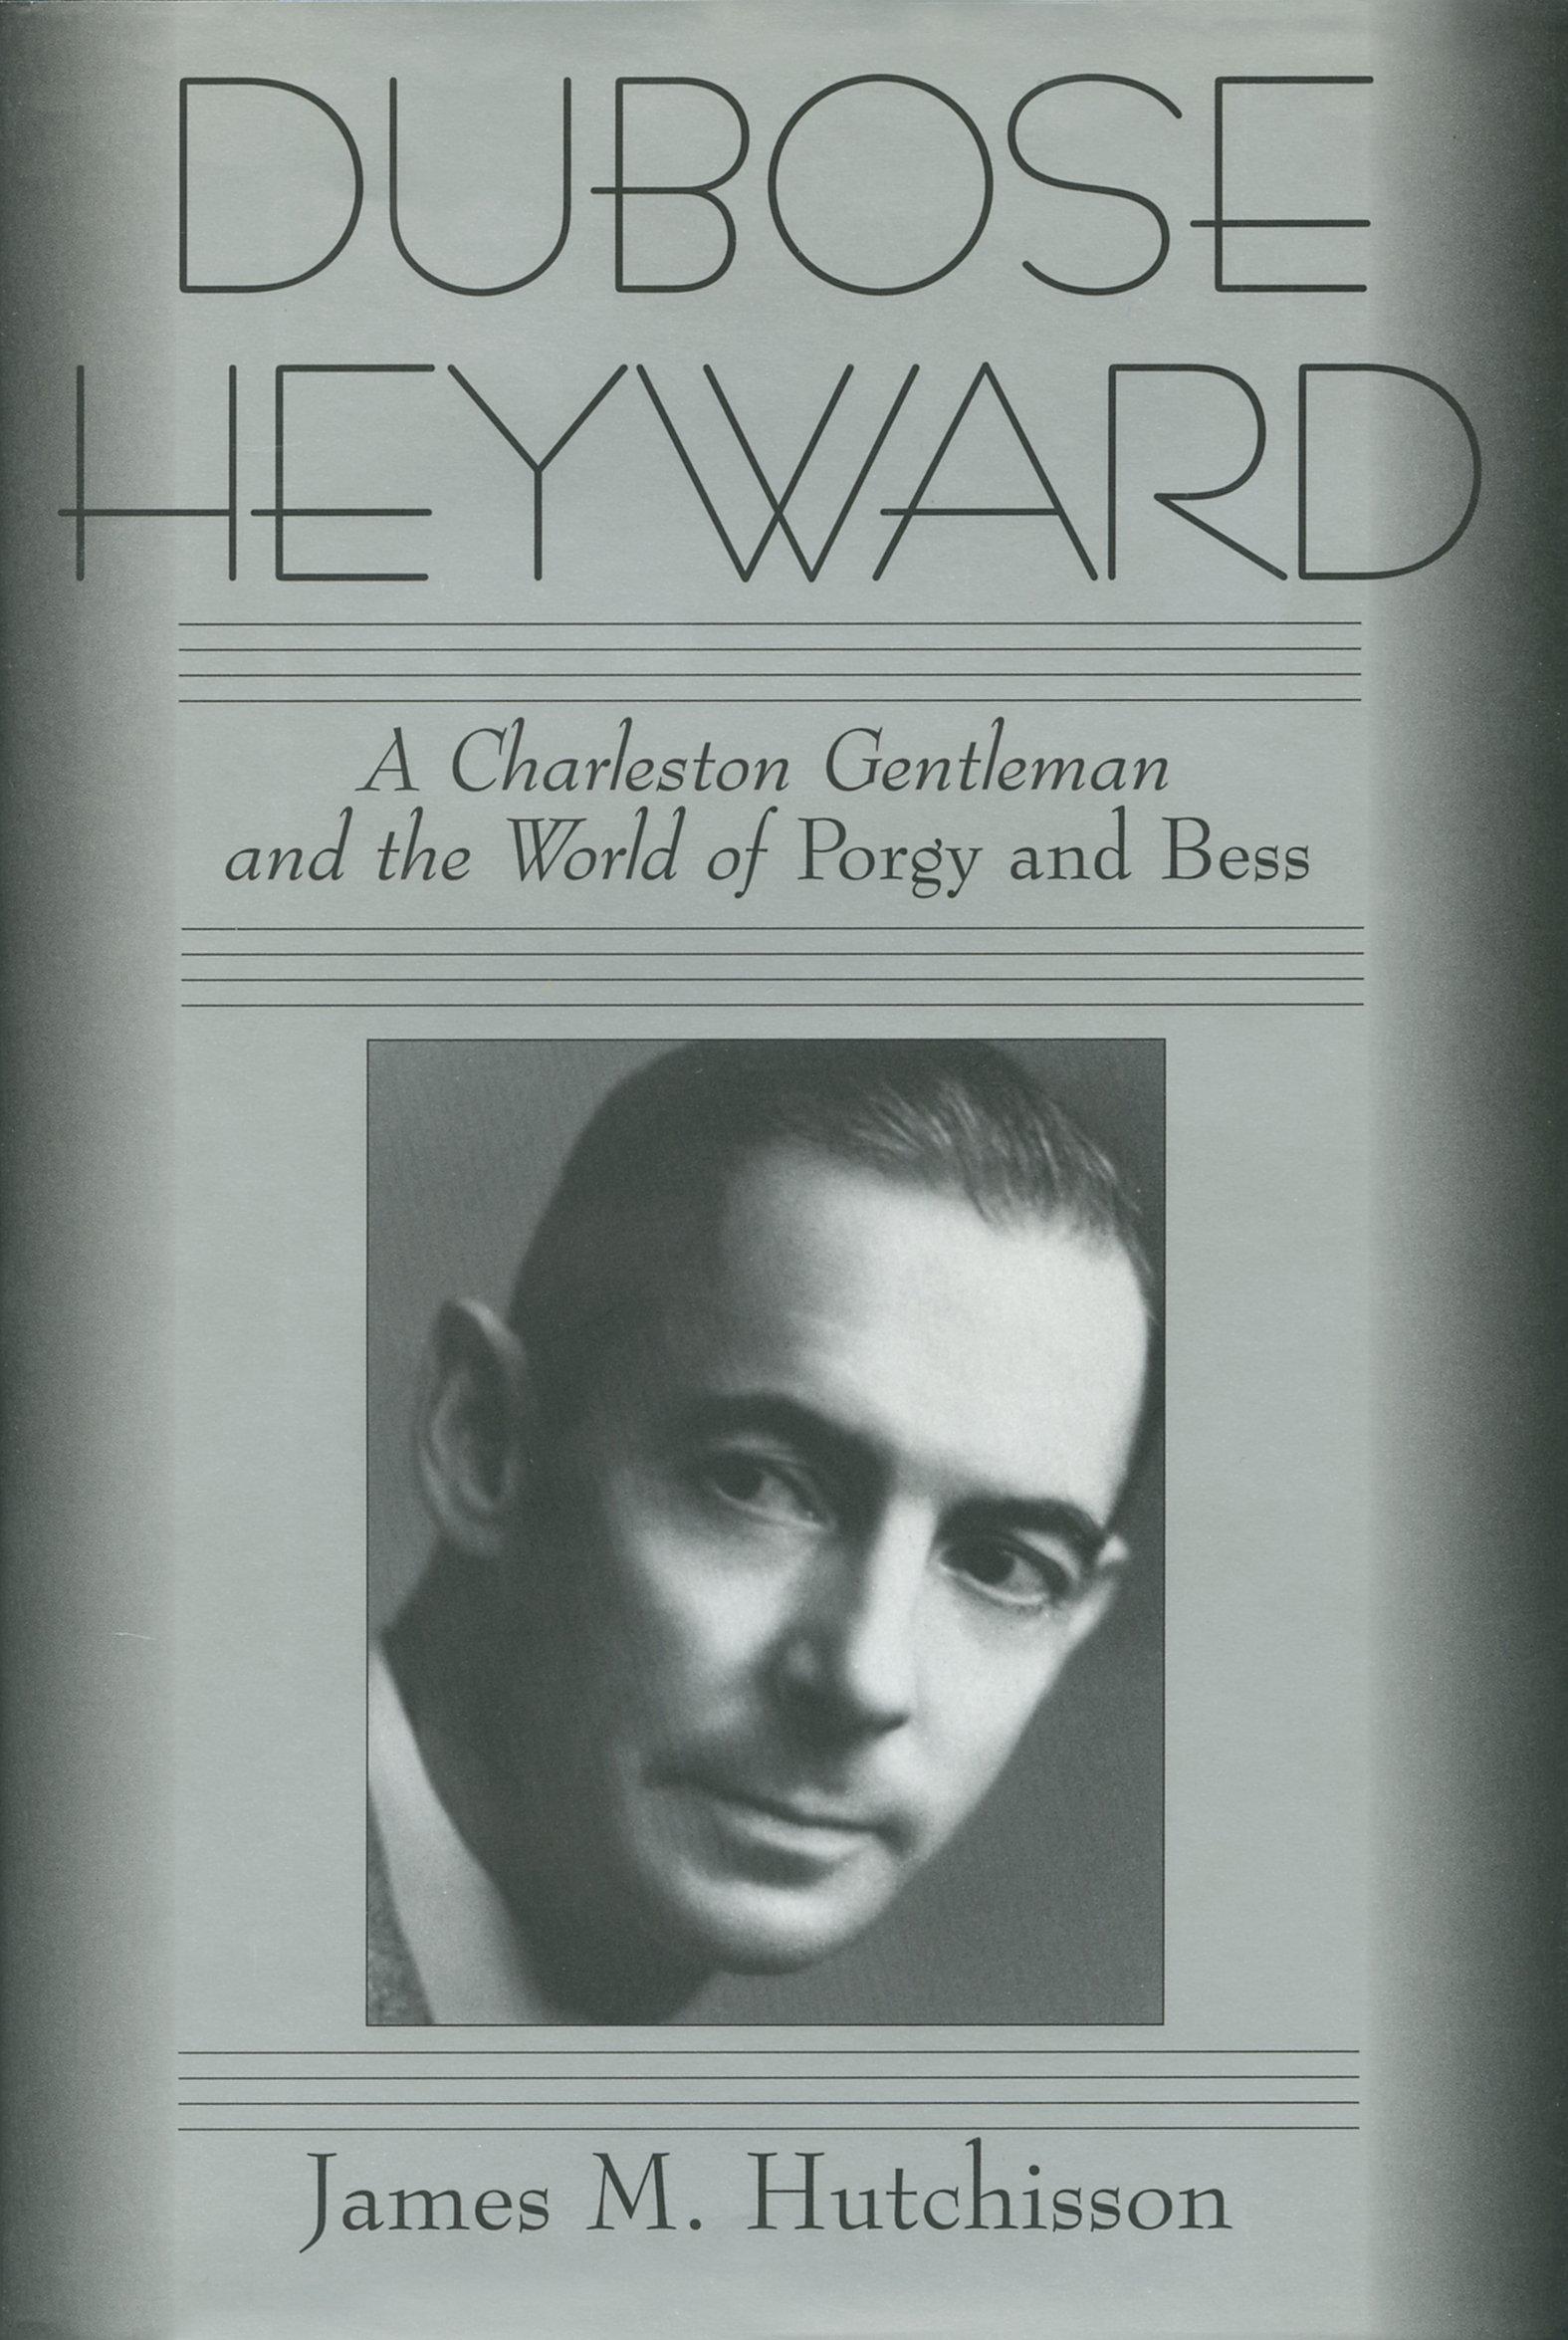 DuBose Heyward: A Charleston Gentleman and the World of Porgy and Bess pdf epub